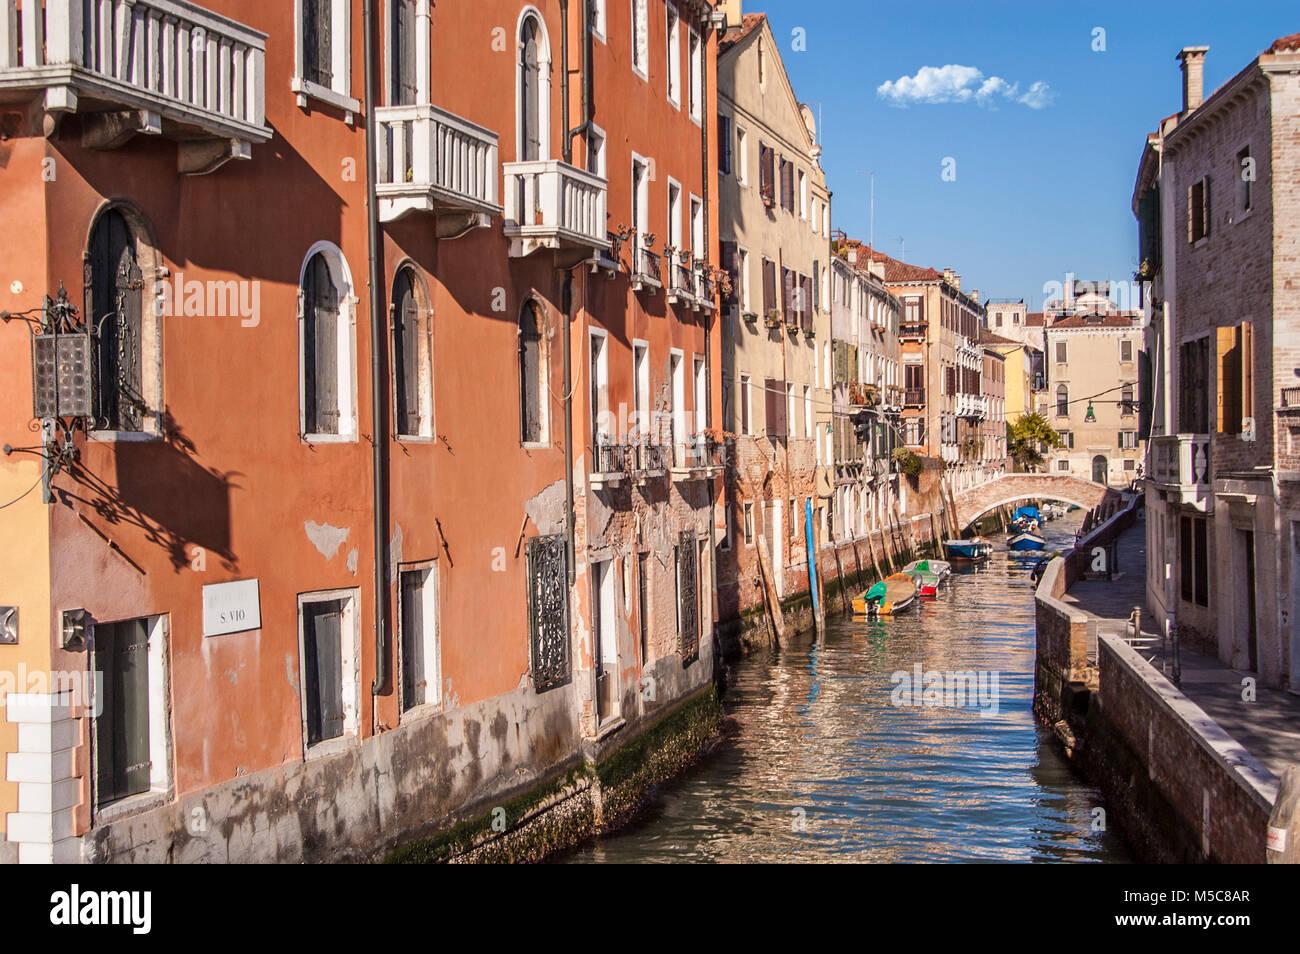 Venedig, Canal in Fondamenta Zattere allo Spirito Santo Stockbild